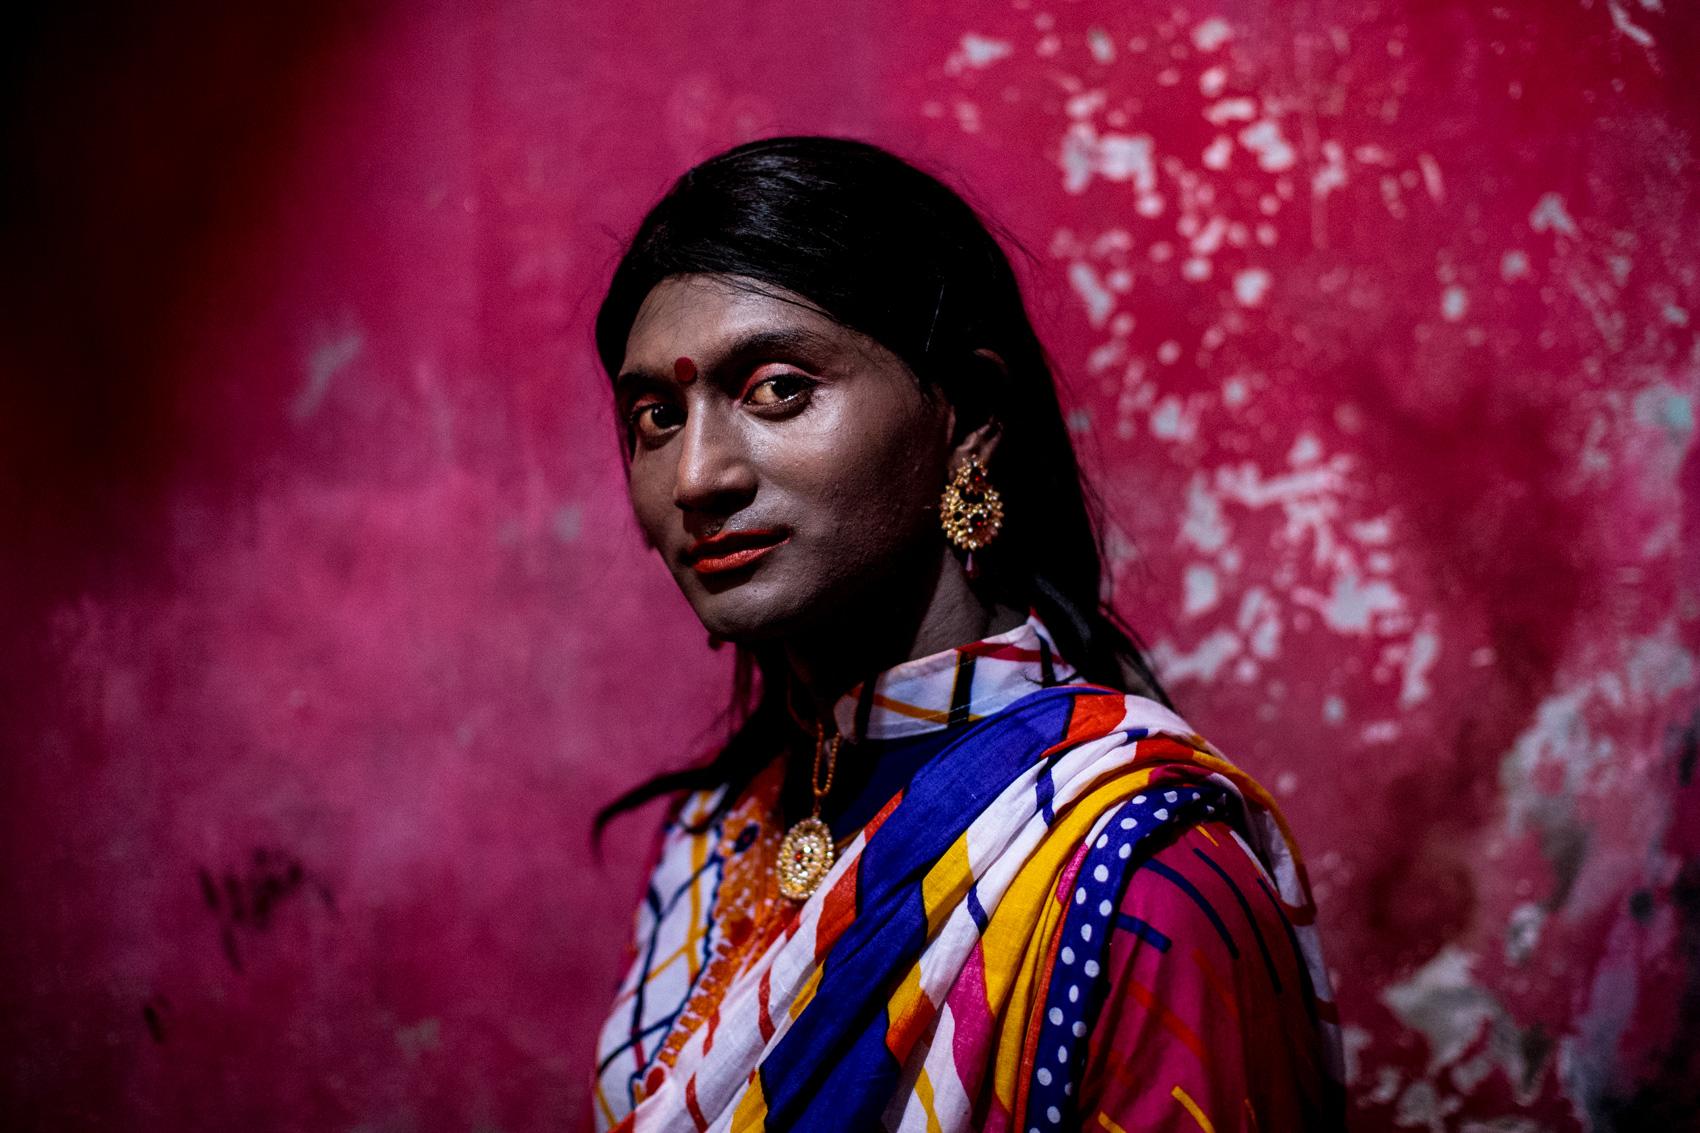 DHAKA, BANGLADESH: Aupurbo Hijra, age 29